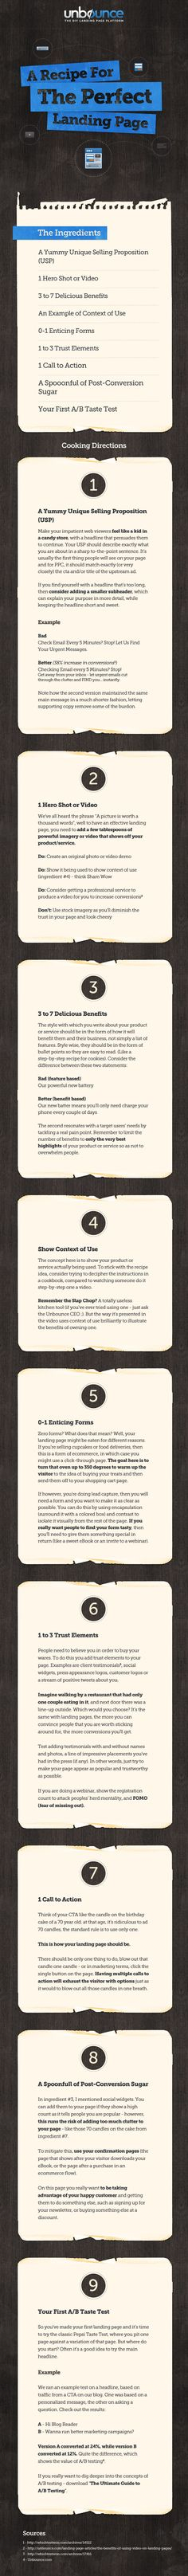 Receta para una Landing Page perfecta #infografia #infographic #marketing :: Para saber más... http://materialesmarketing.wordpress.com/2013/04/23/receta-para-una-landing-page-perfecta-infografia-infographic-marketing/